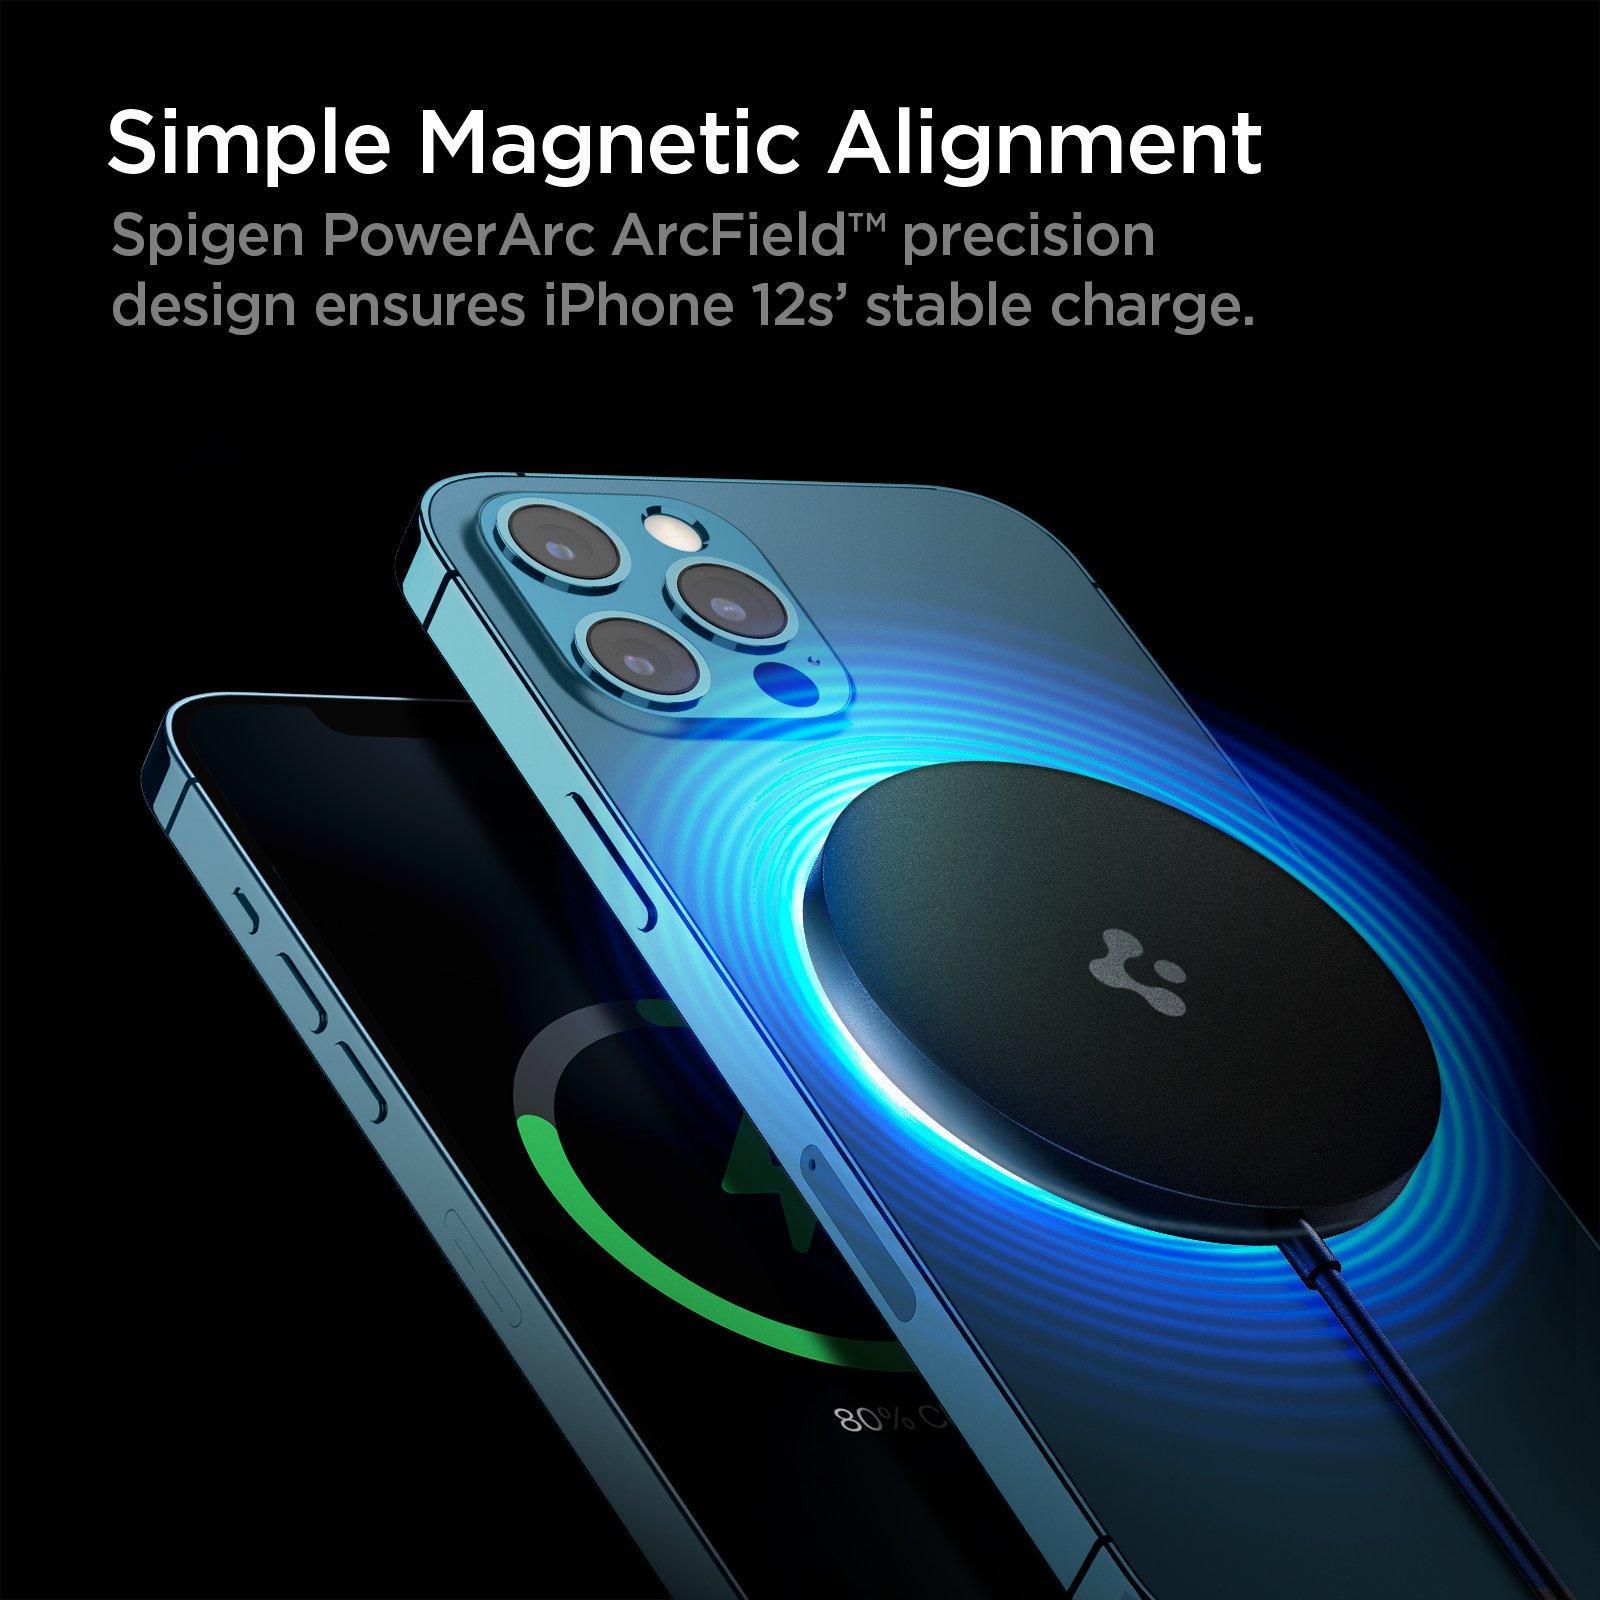 Spigen® PowerArc ArcField™ ACH02190 Magnetic Wireless MagSafe Charger - Black